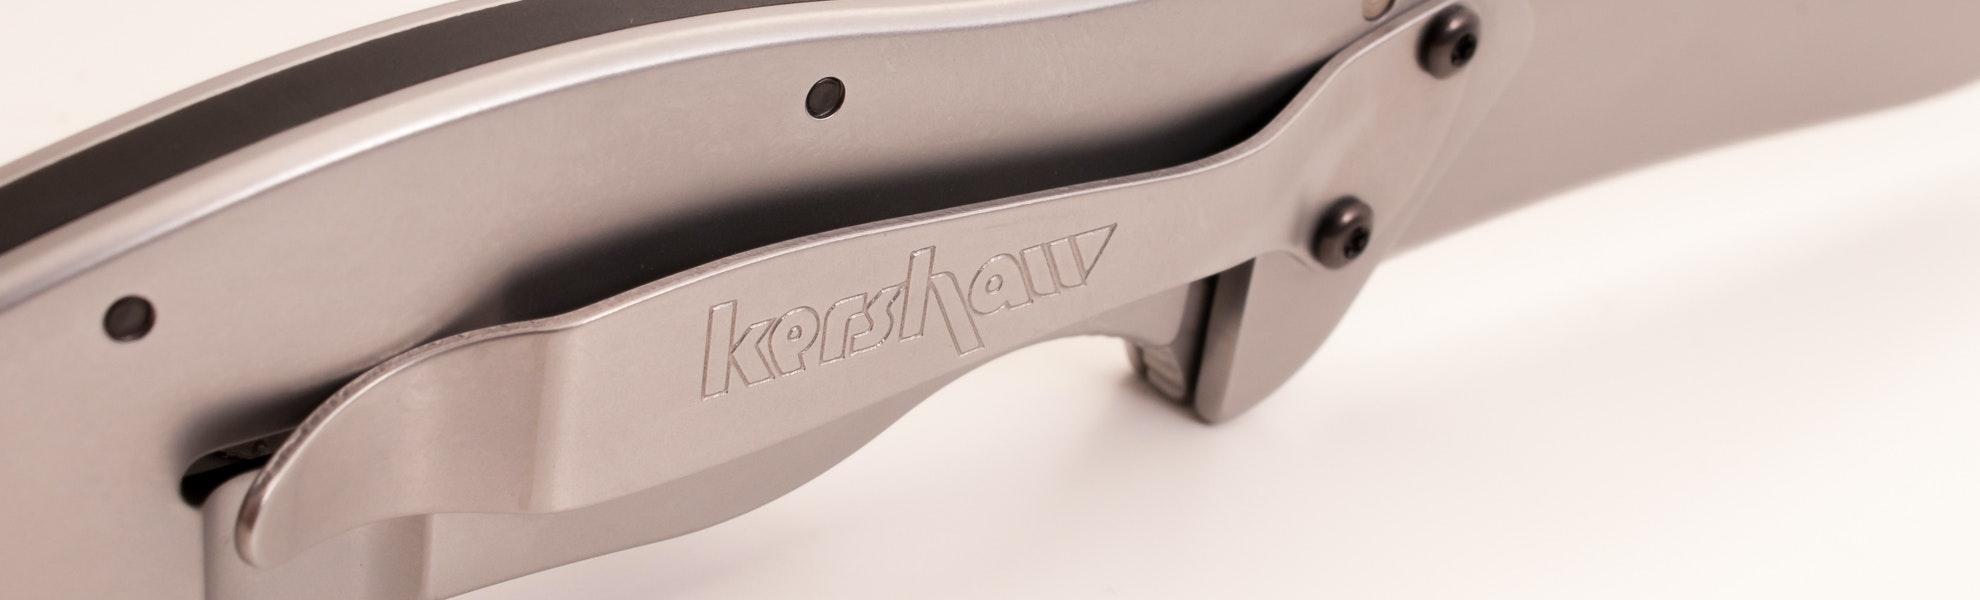 Kershaw Shallot Knife